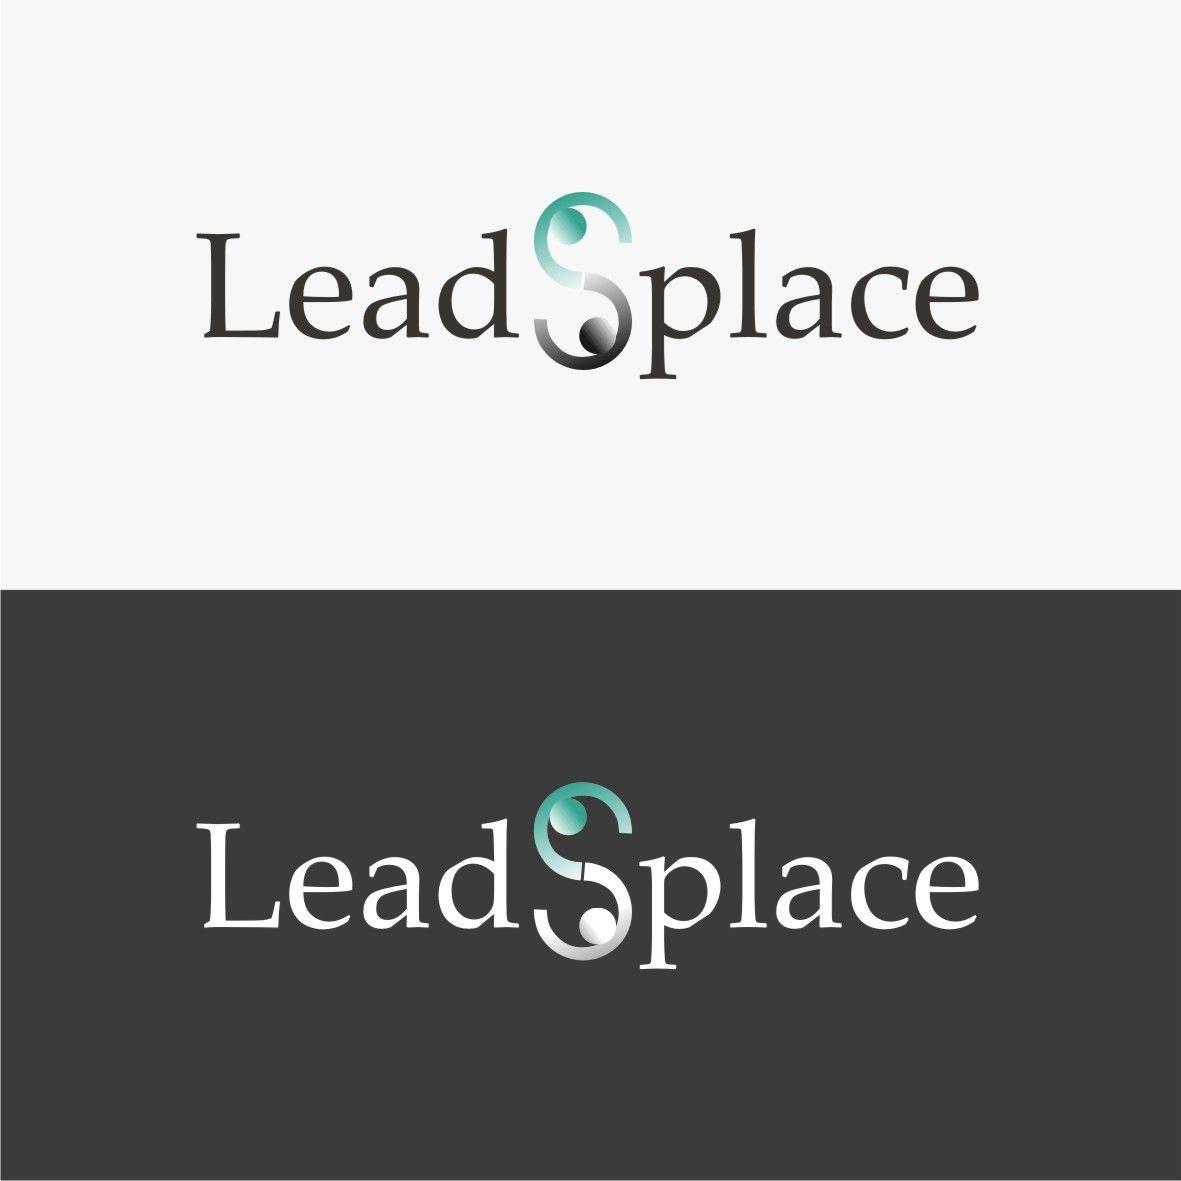 leadsplace.com - логотип - дизайнер KovalevaV8